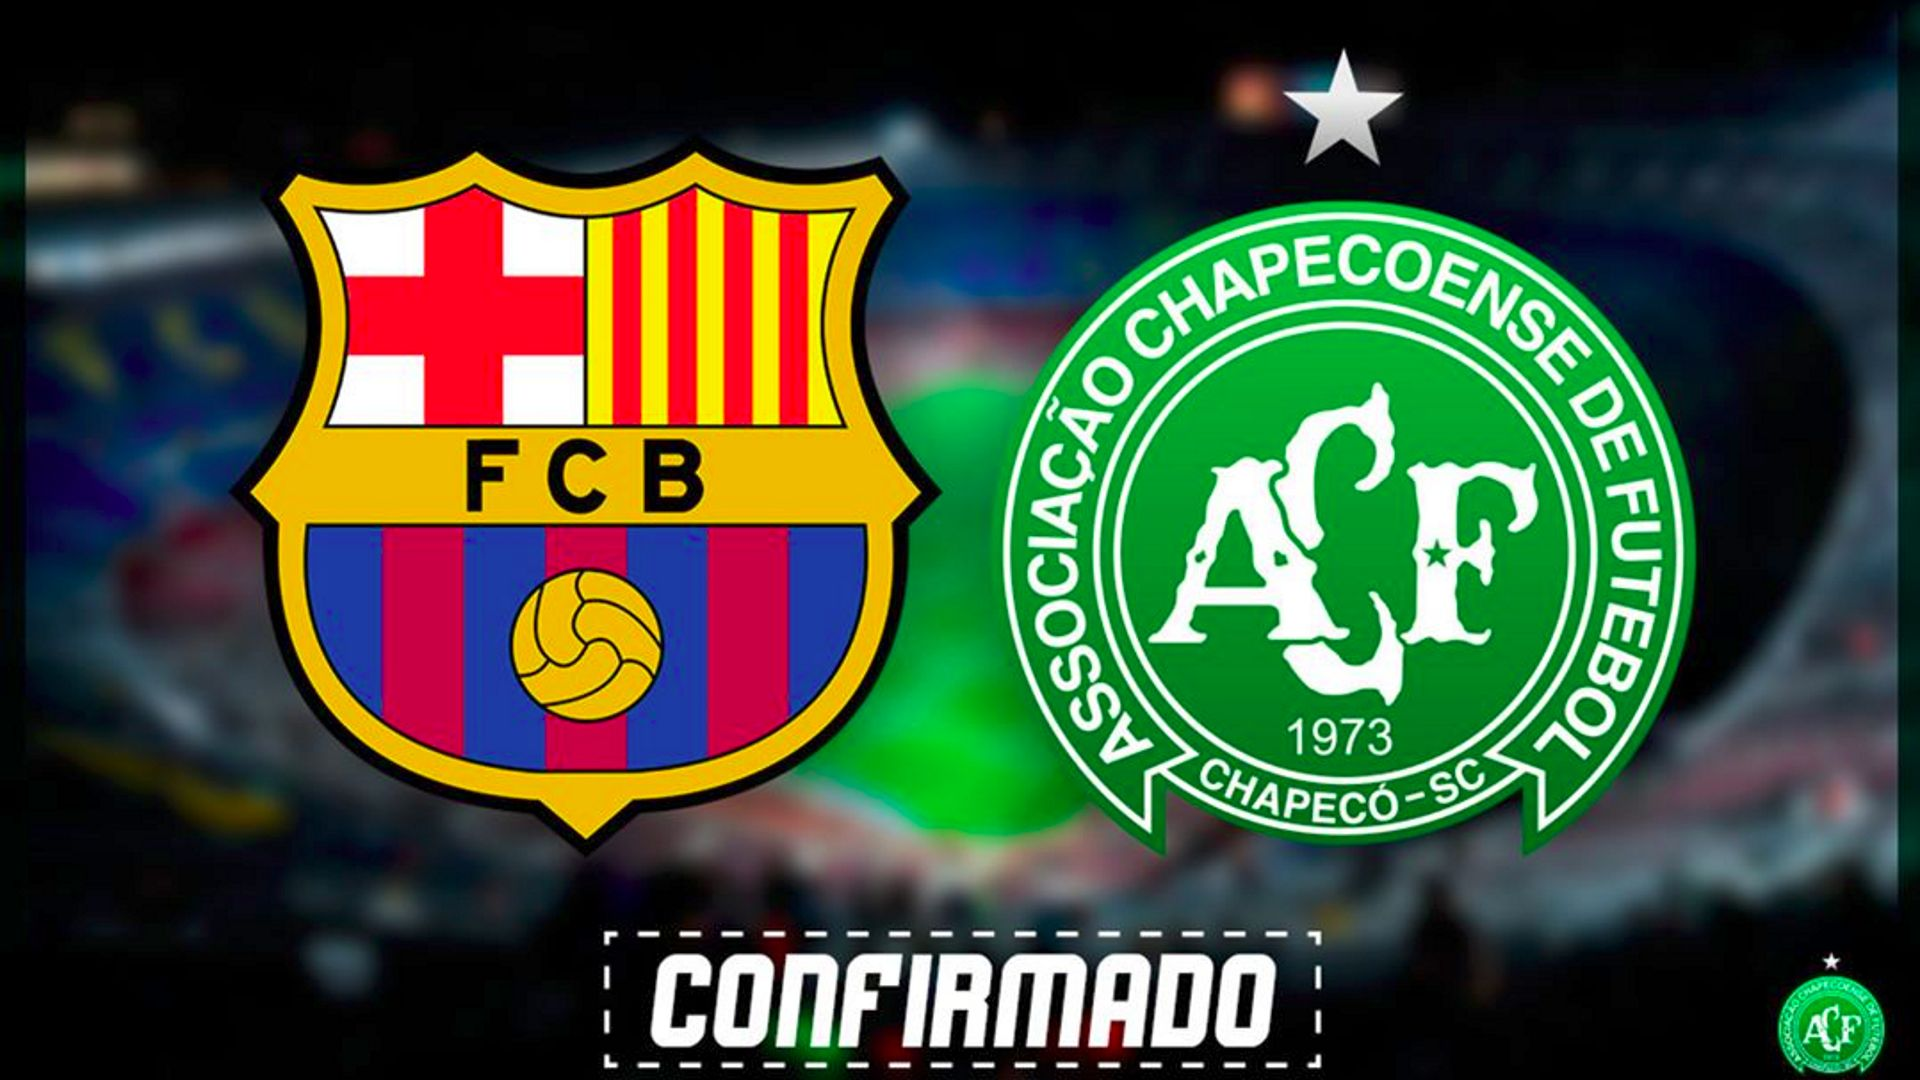 Chapecoense enfrenta Barcelona hoje em torneio amistoso